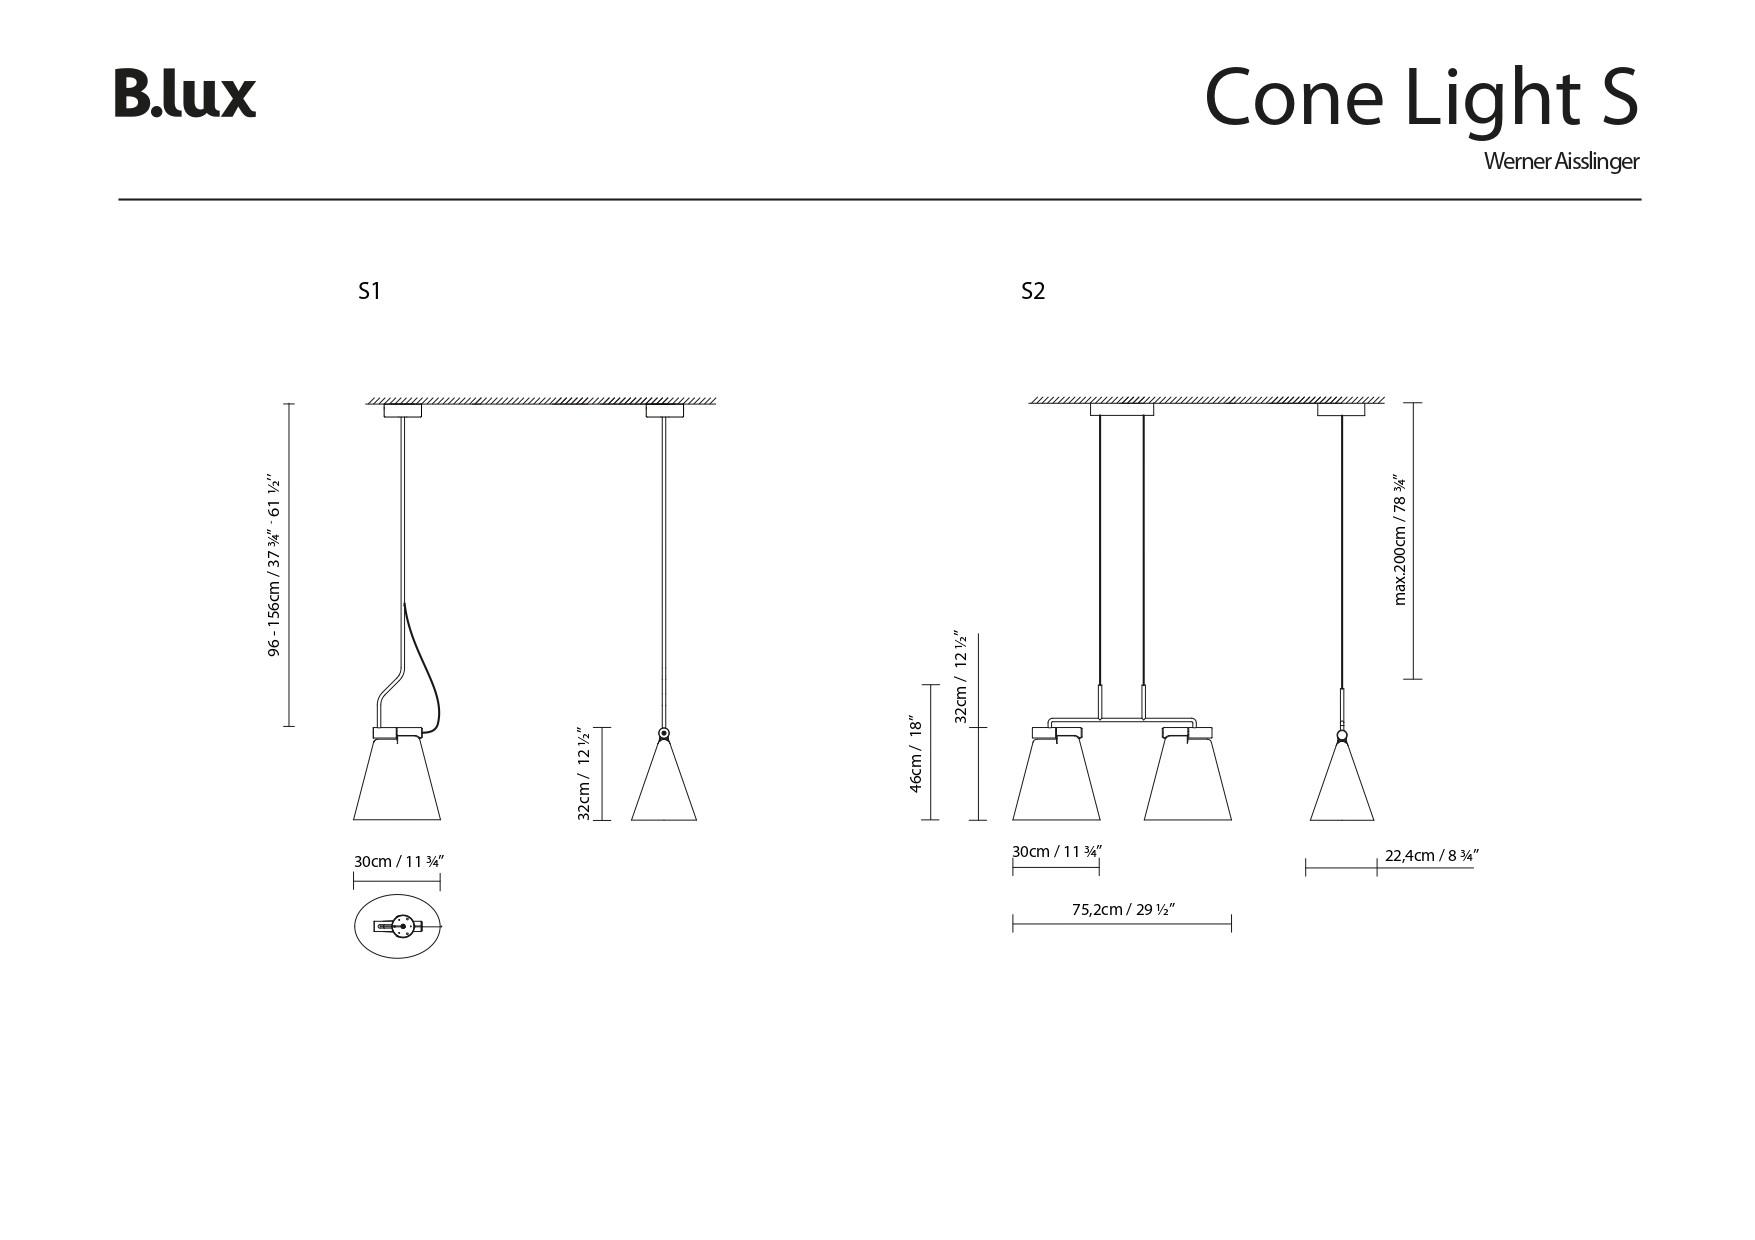 CONE LIGHT BLUX